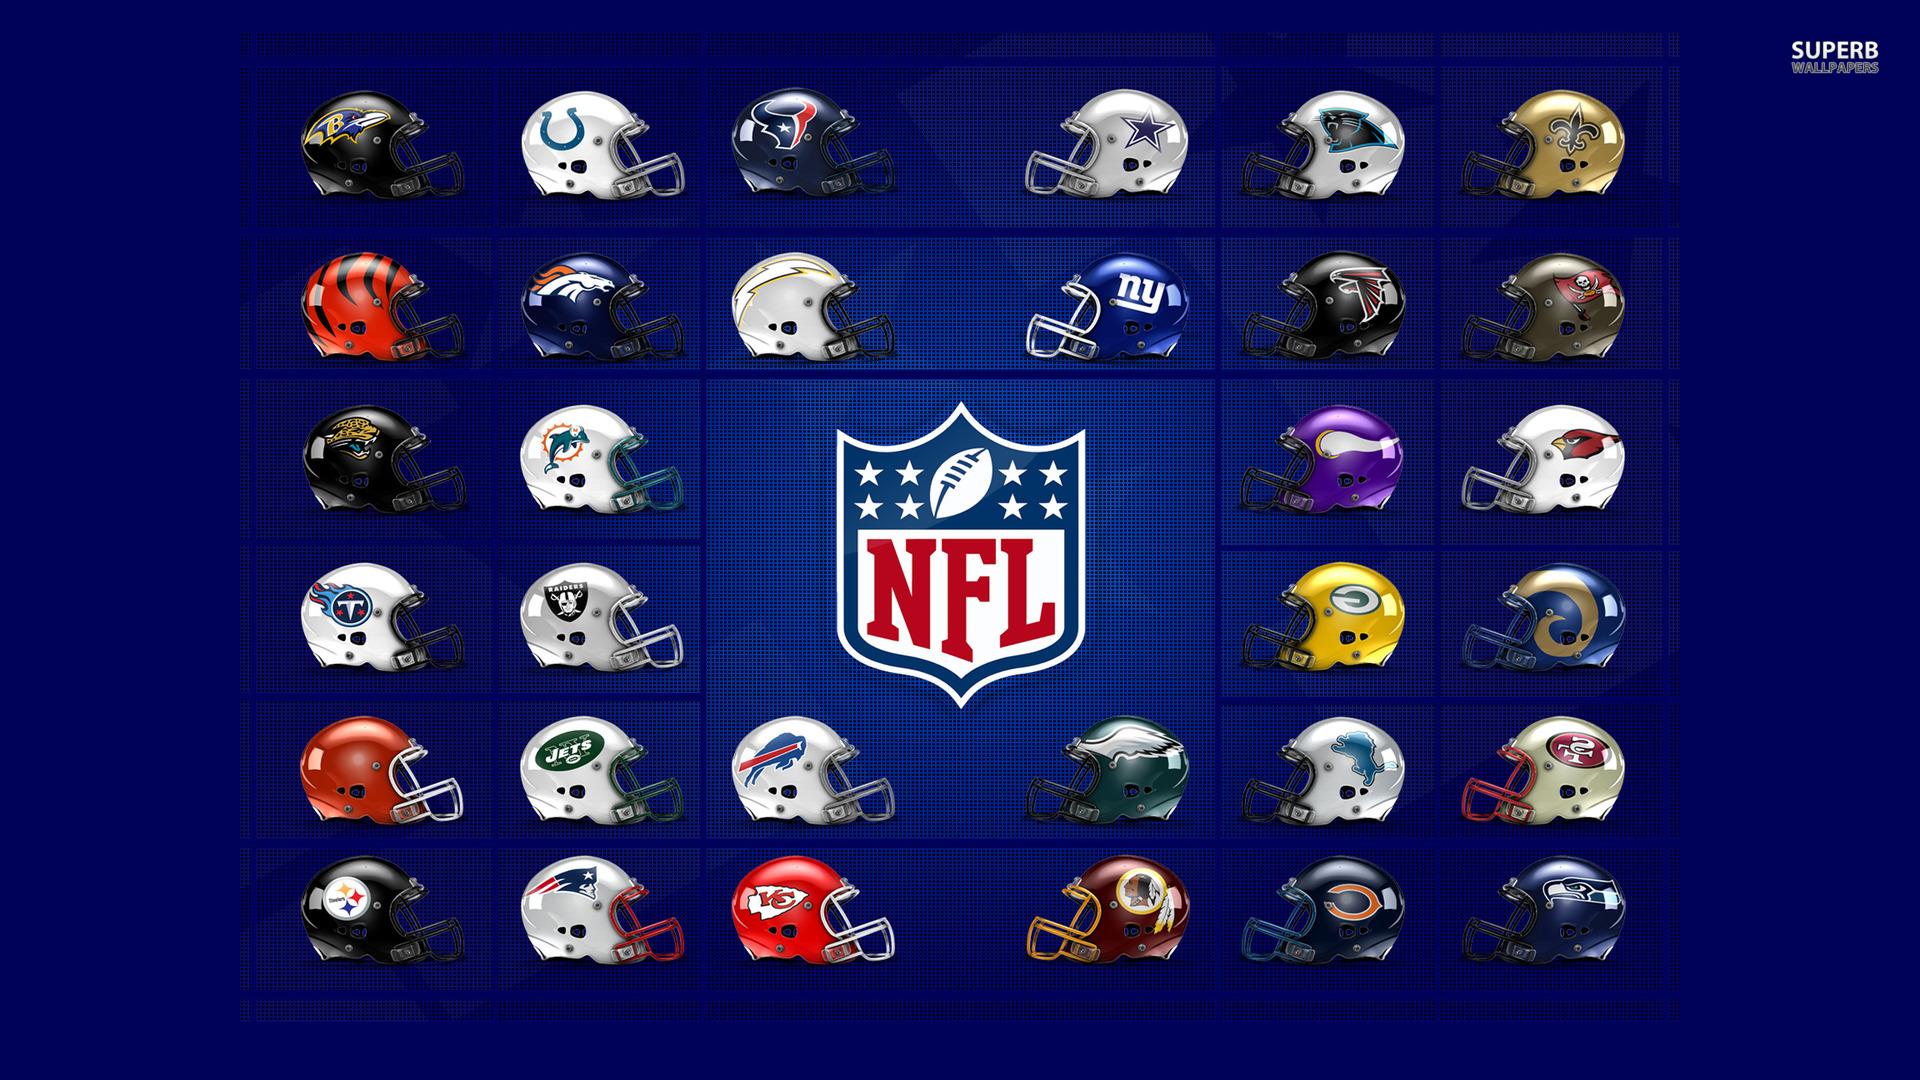 NFL Logo Wallpaper Download HD Wallpapers 1920x1080